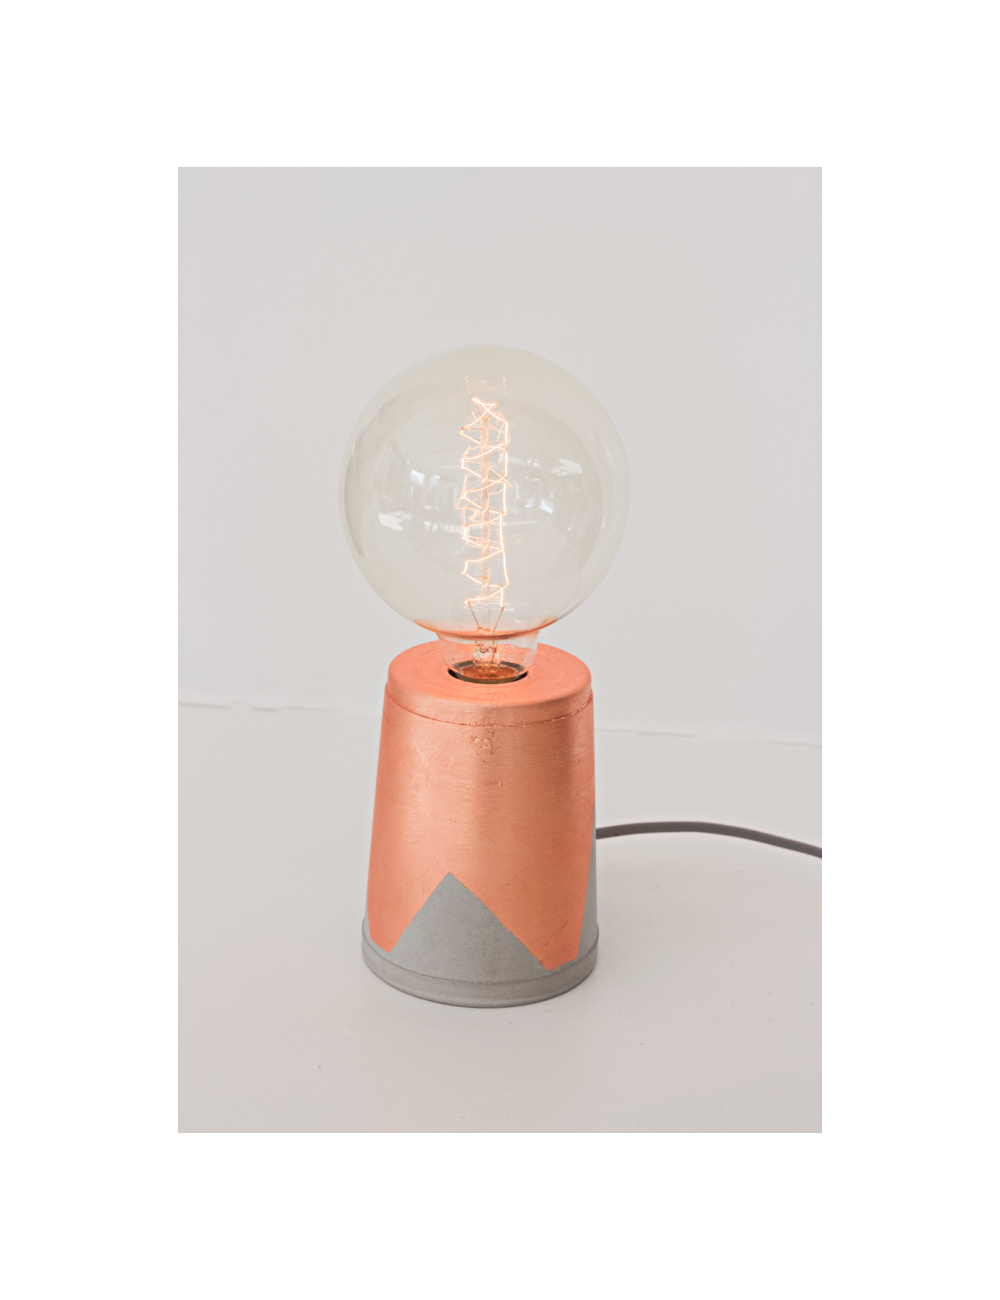 Lampe cuivrée pieds de biche beton made in belgium